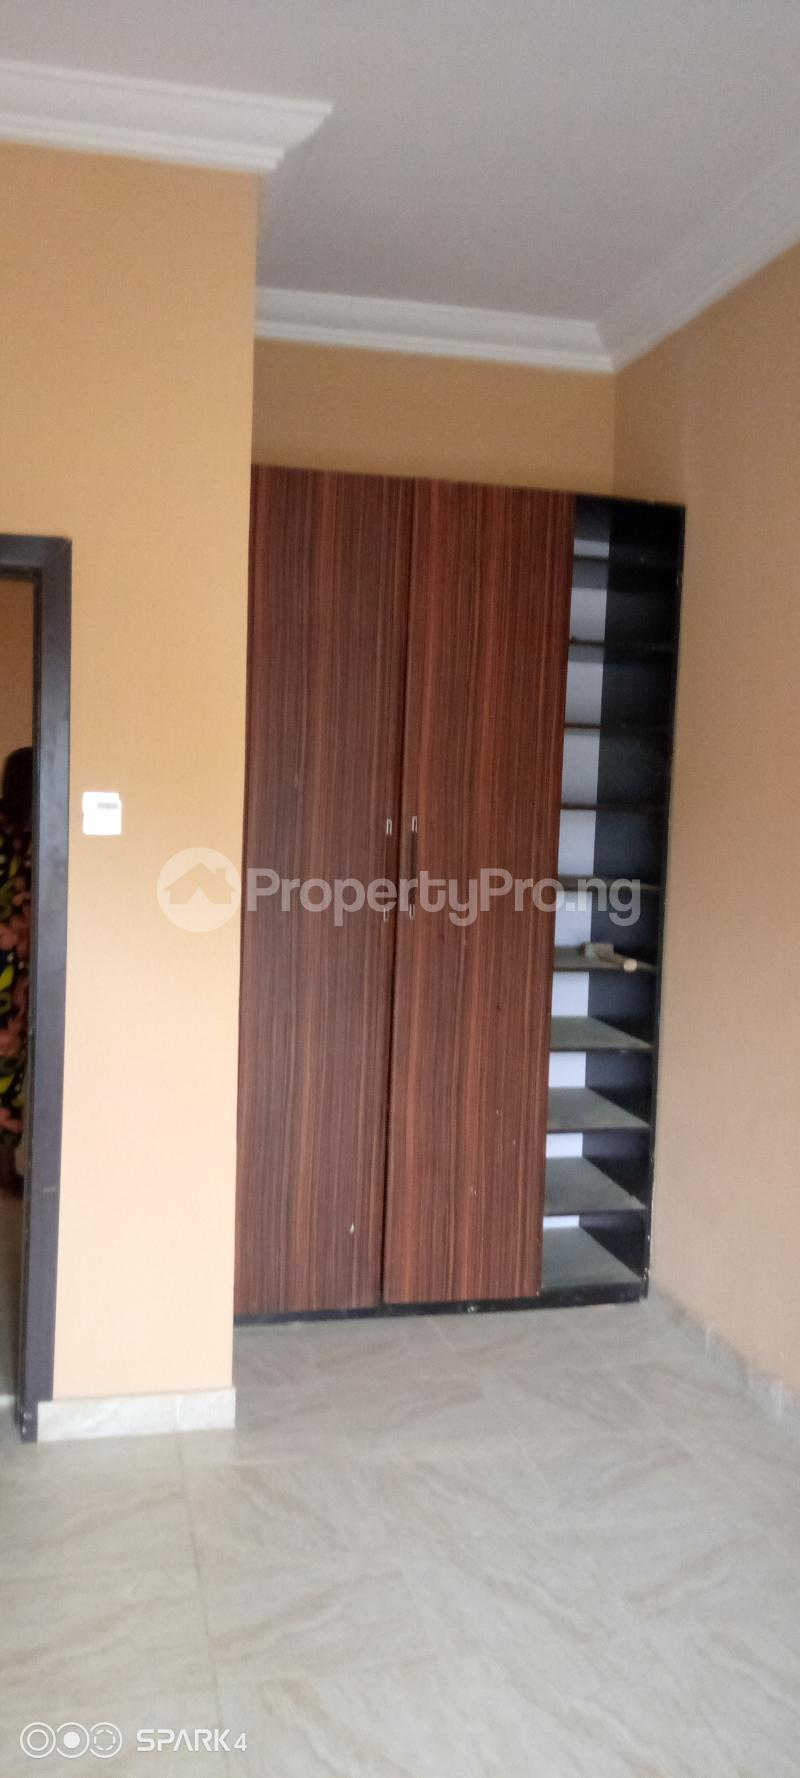 3 bedroom Studio Apartment for rent Magboro Magboro Obafemi Owode Ogun - 5